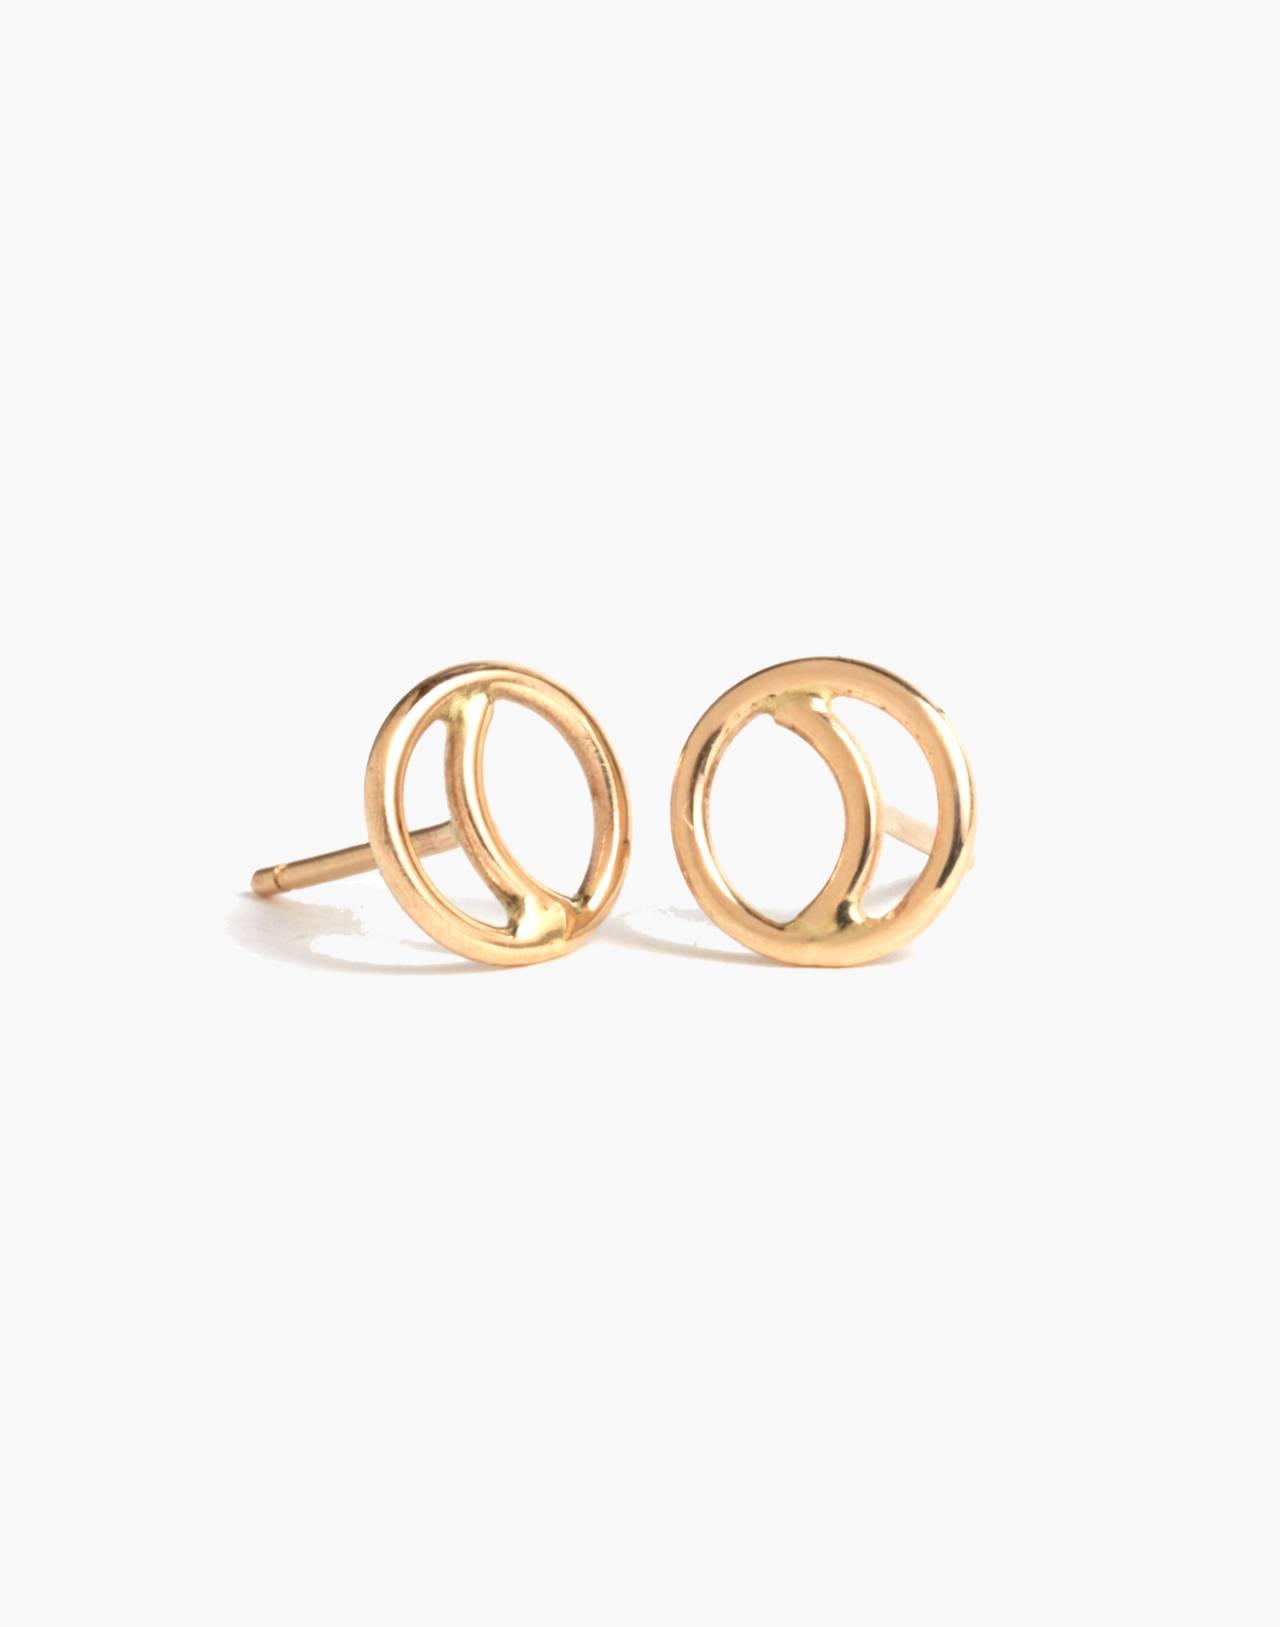 Melissa Joy Manning® 14k Gold Crescent Moon Stud Earrings in gold image 1